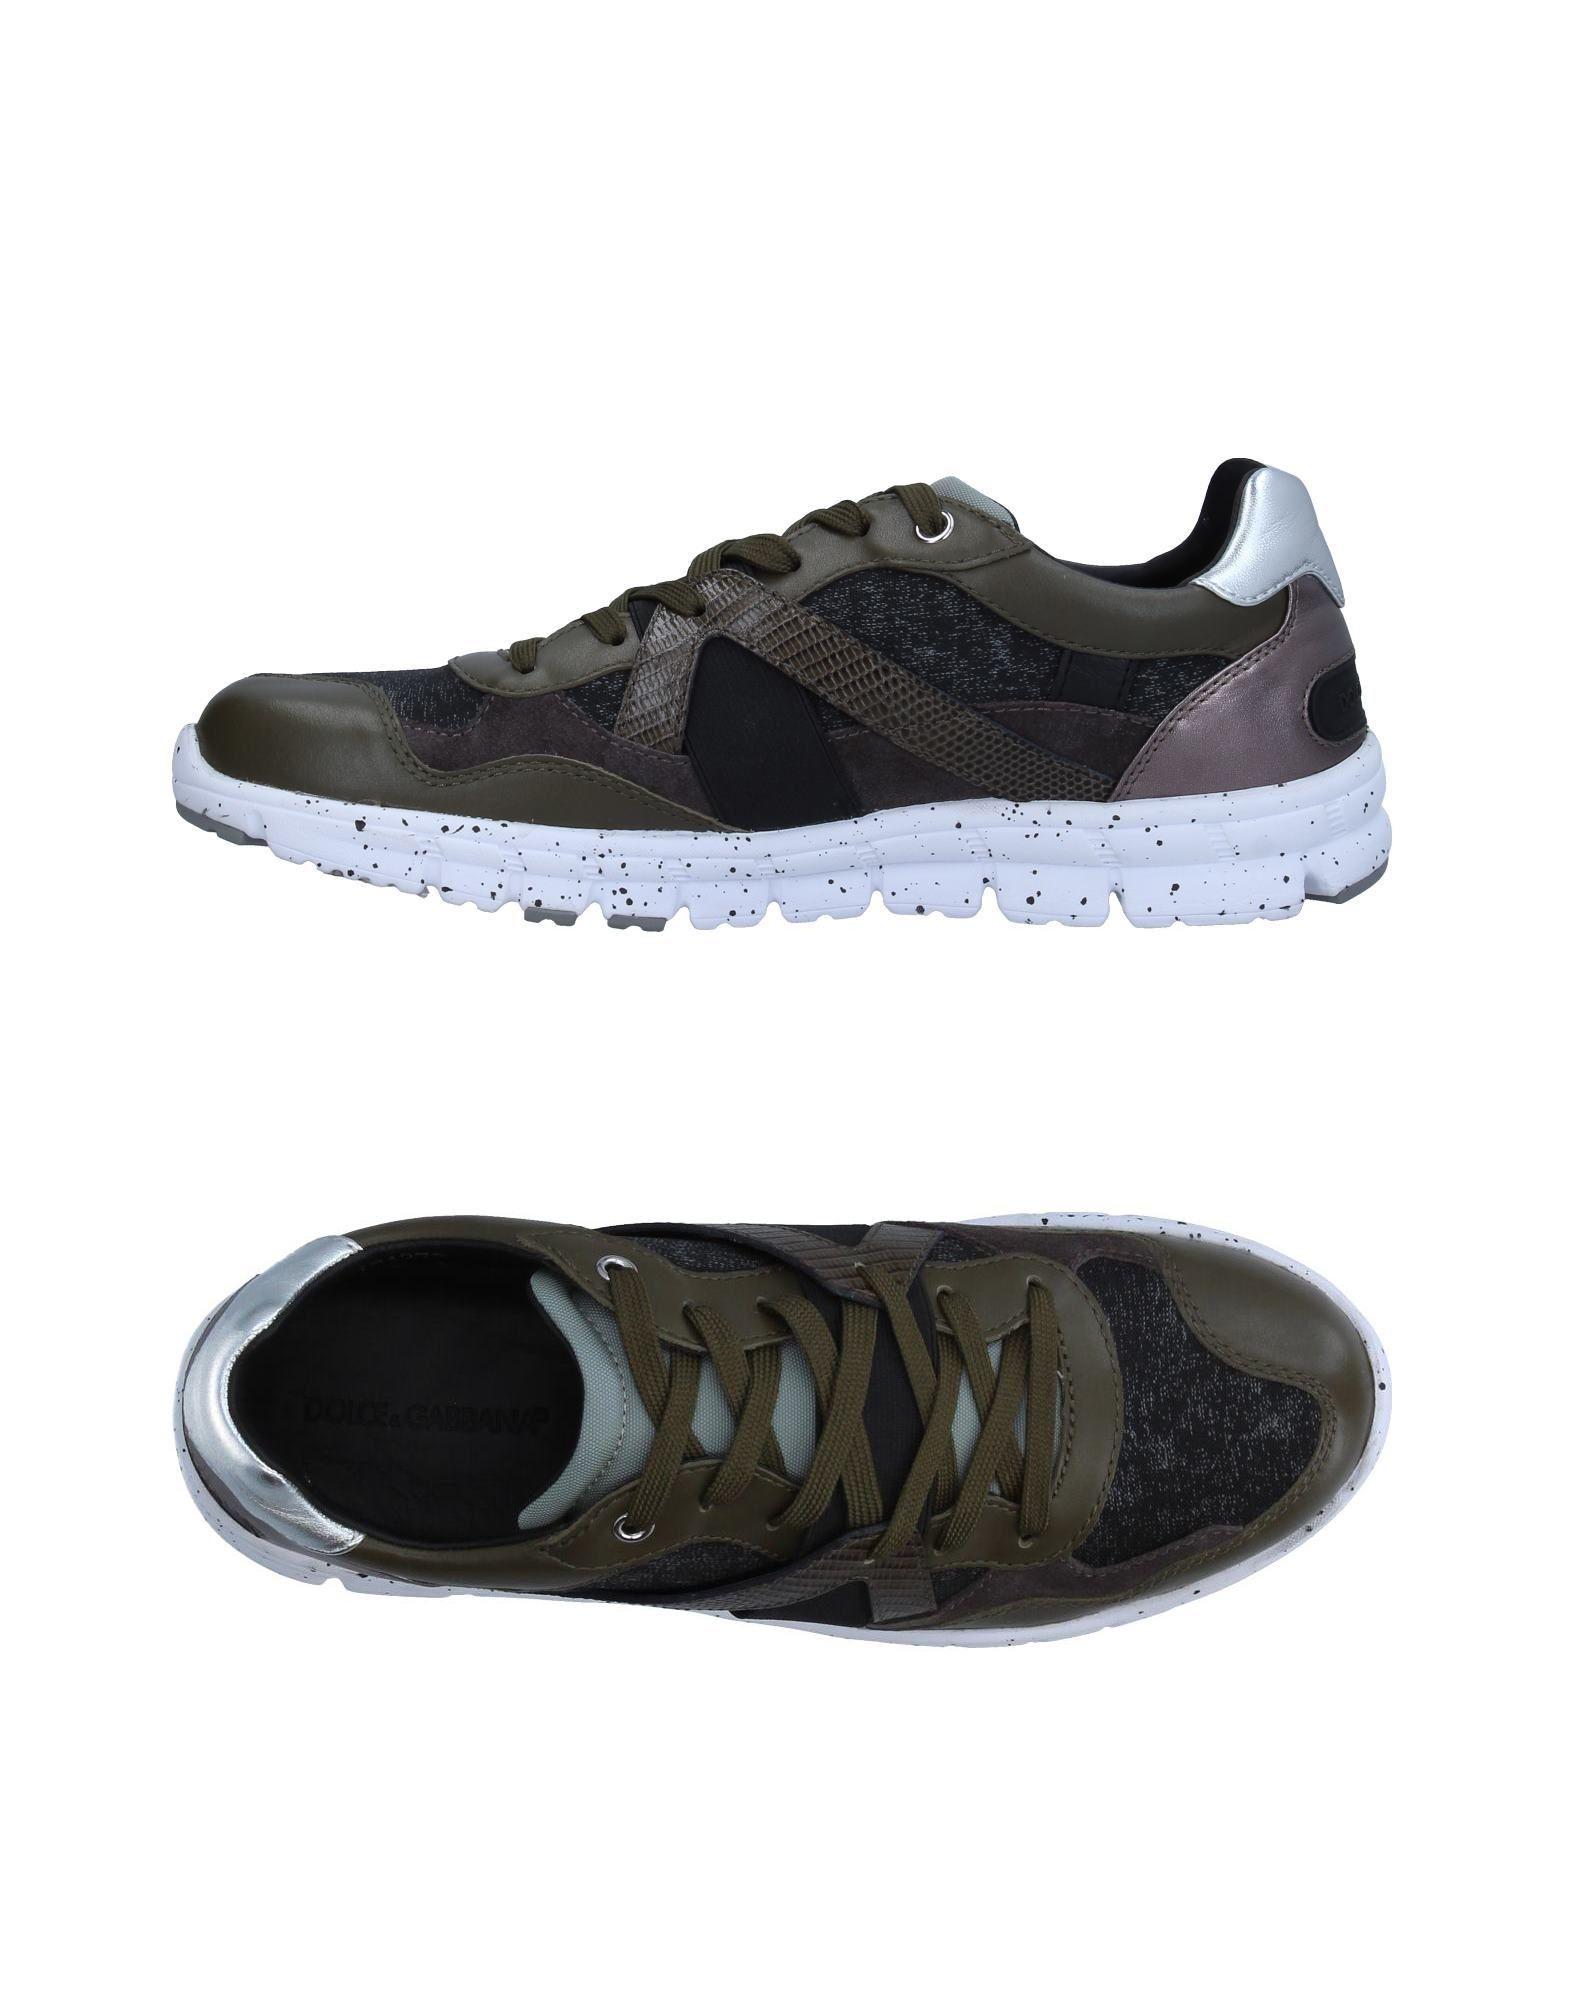 Dolce & Gabbana Sneakers Herren  11336575IU